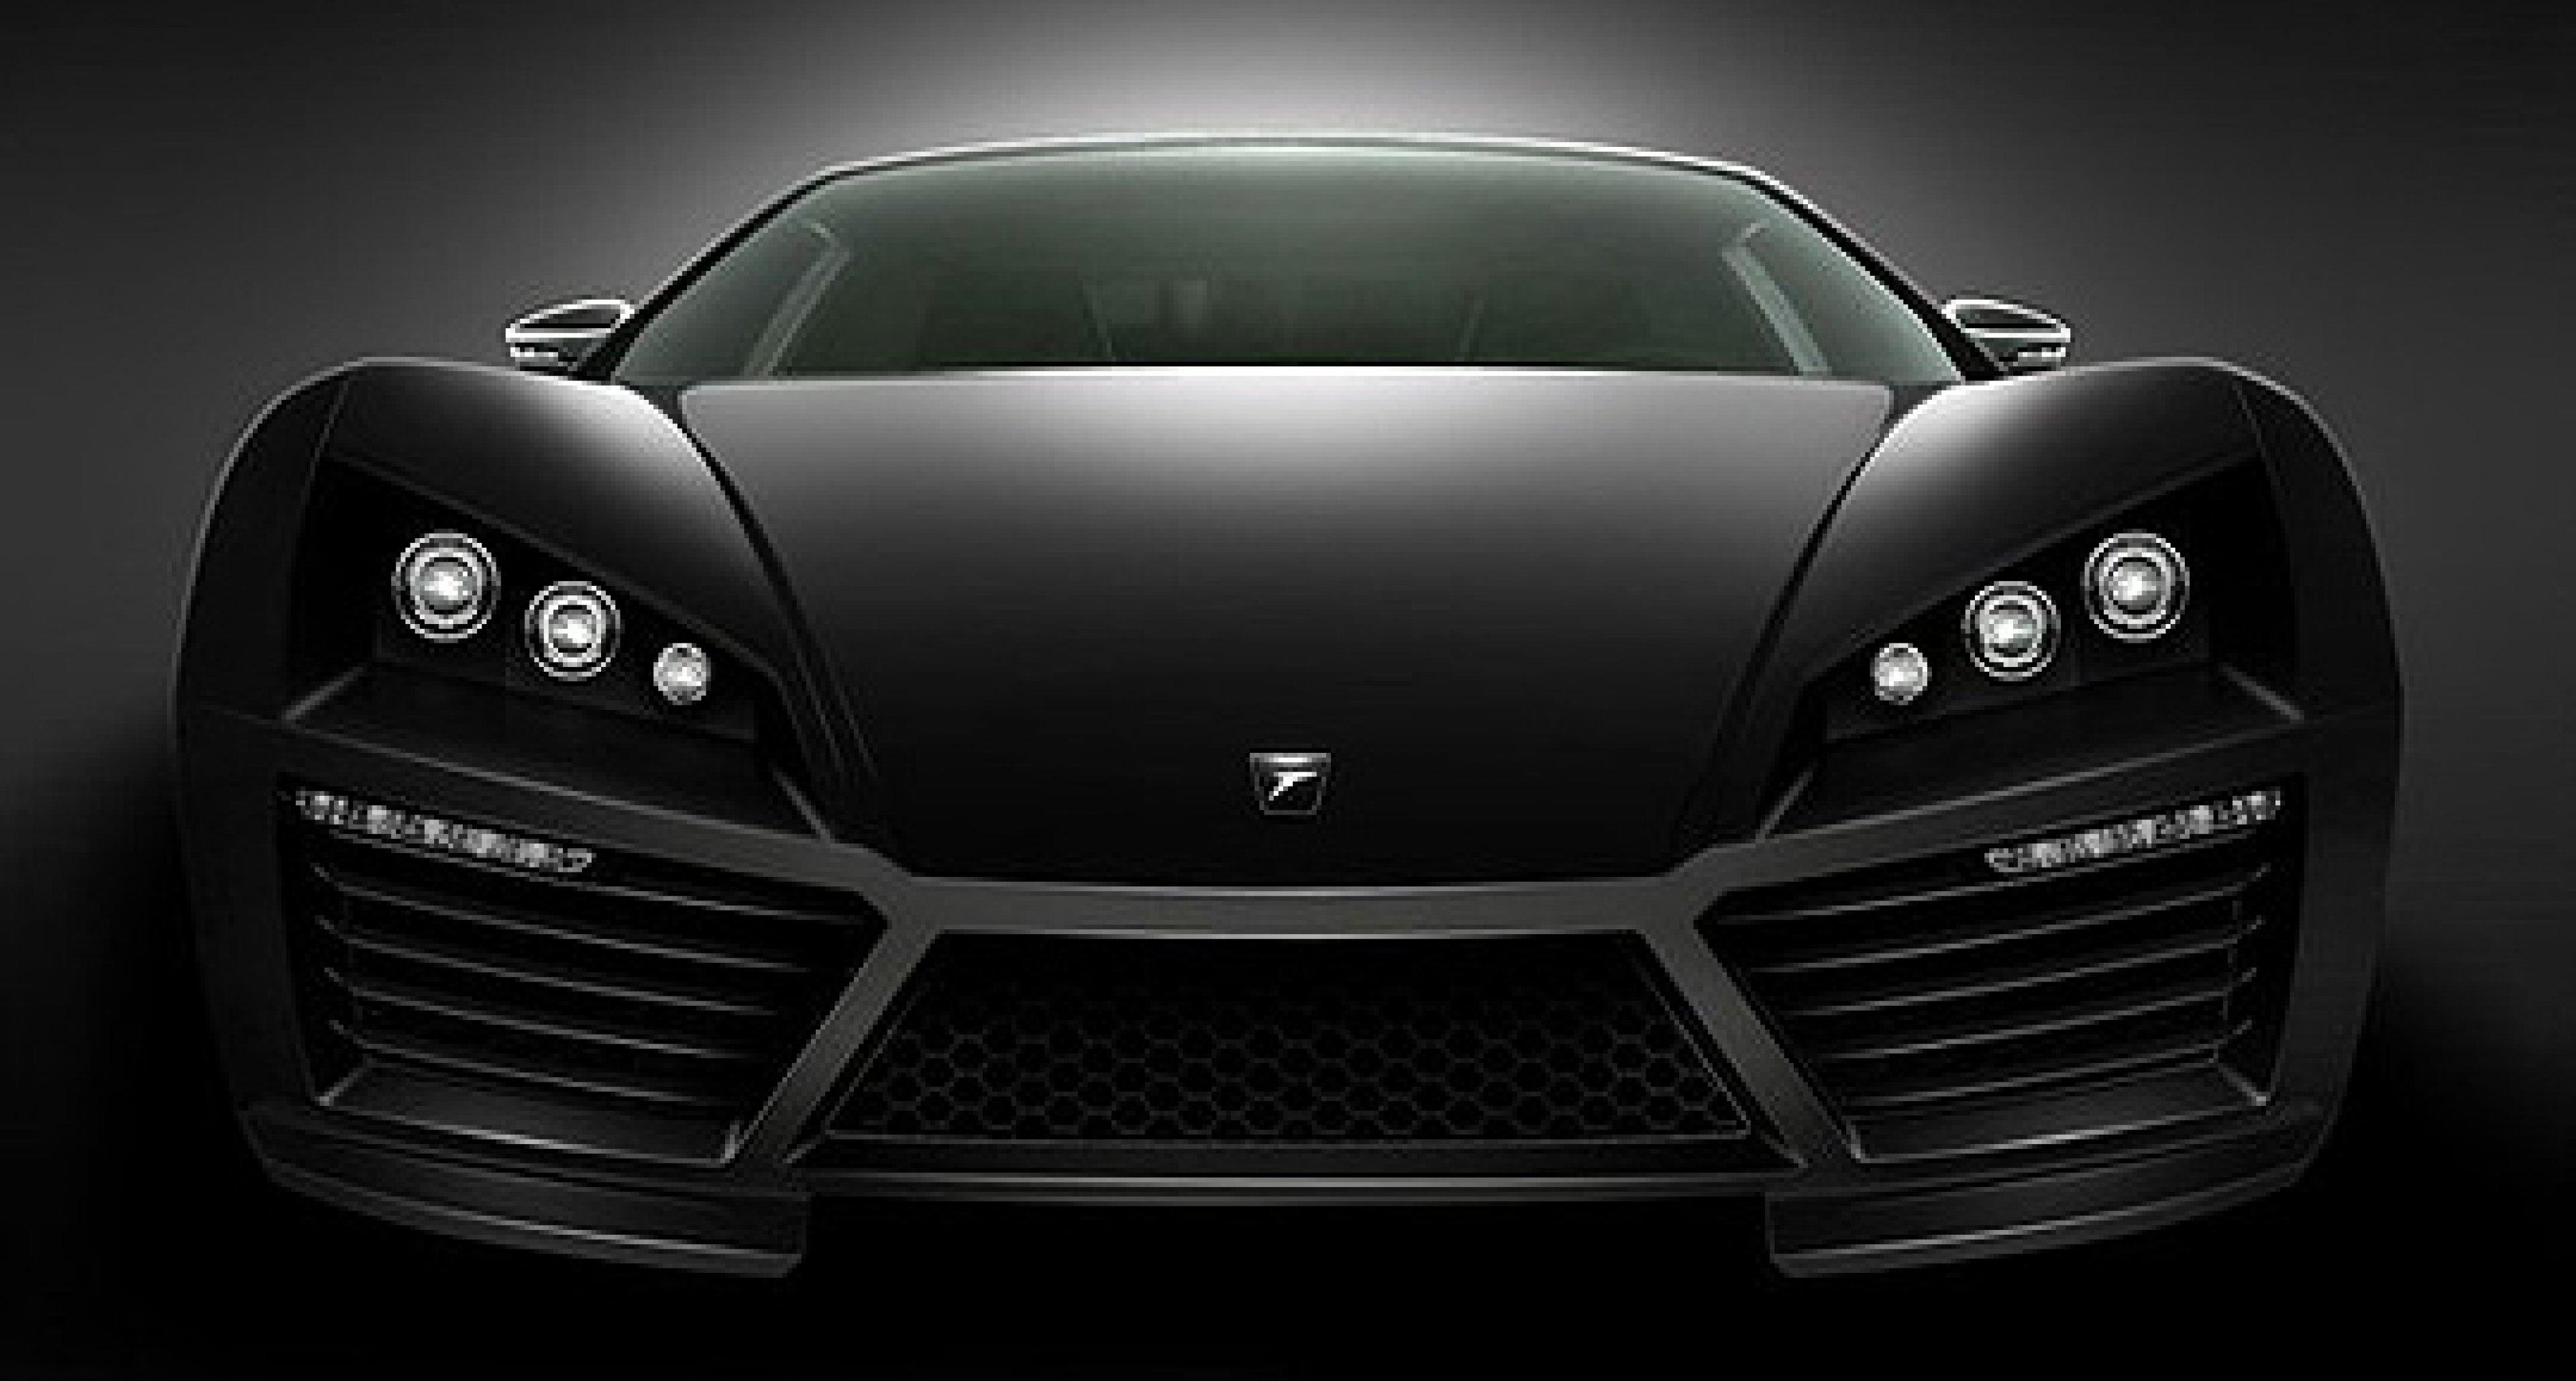 Fenix Automotive: Lee Noble baut eigenen Supersportler